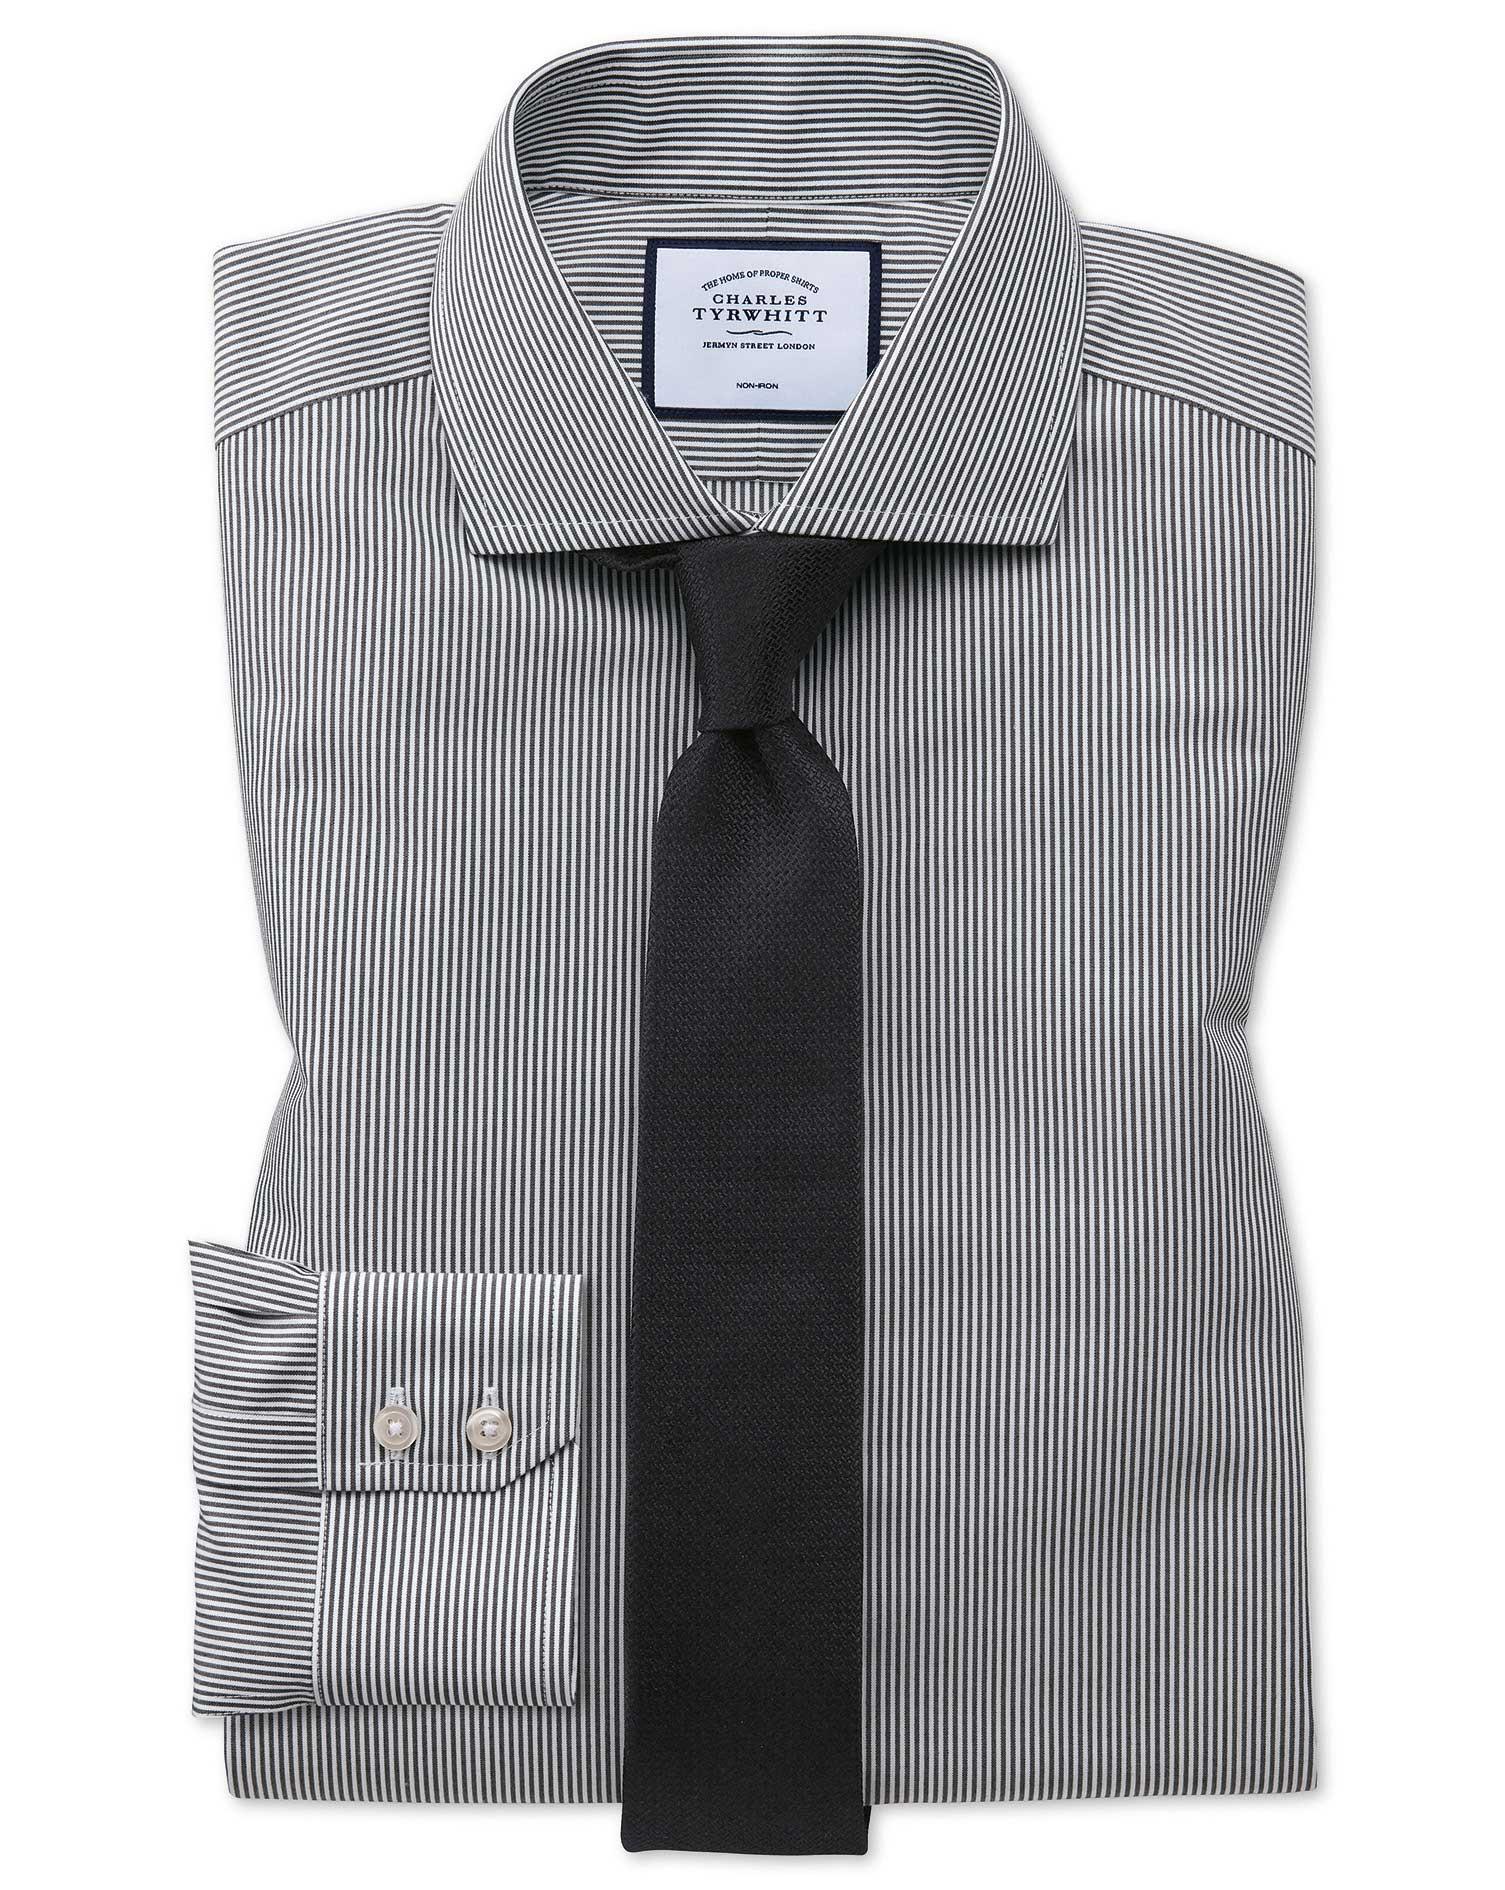 Extra Slim Fit Non-Iron Cutaway Collar Black Bengal Stripe Cotton Formal Shirt Single Cuff Size 15/3